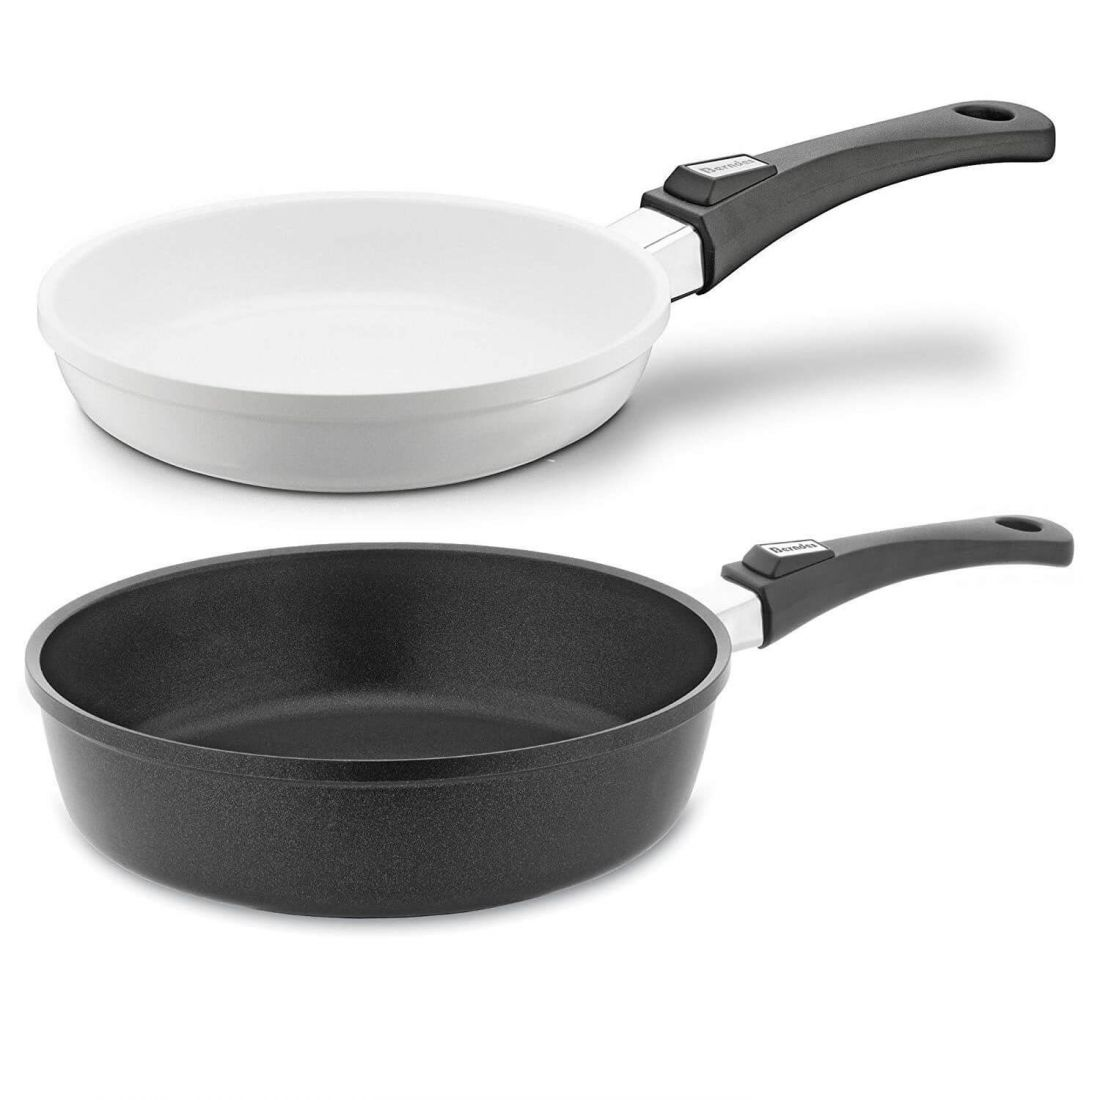 Набор сковорода 24 + сотейник 28, Vario Click Induction Black&White, Berndes